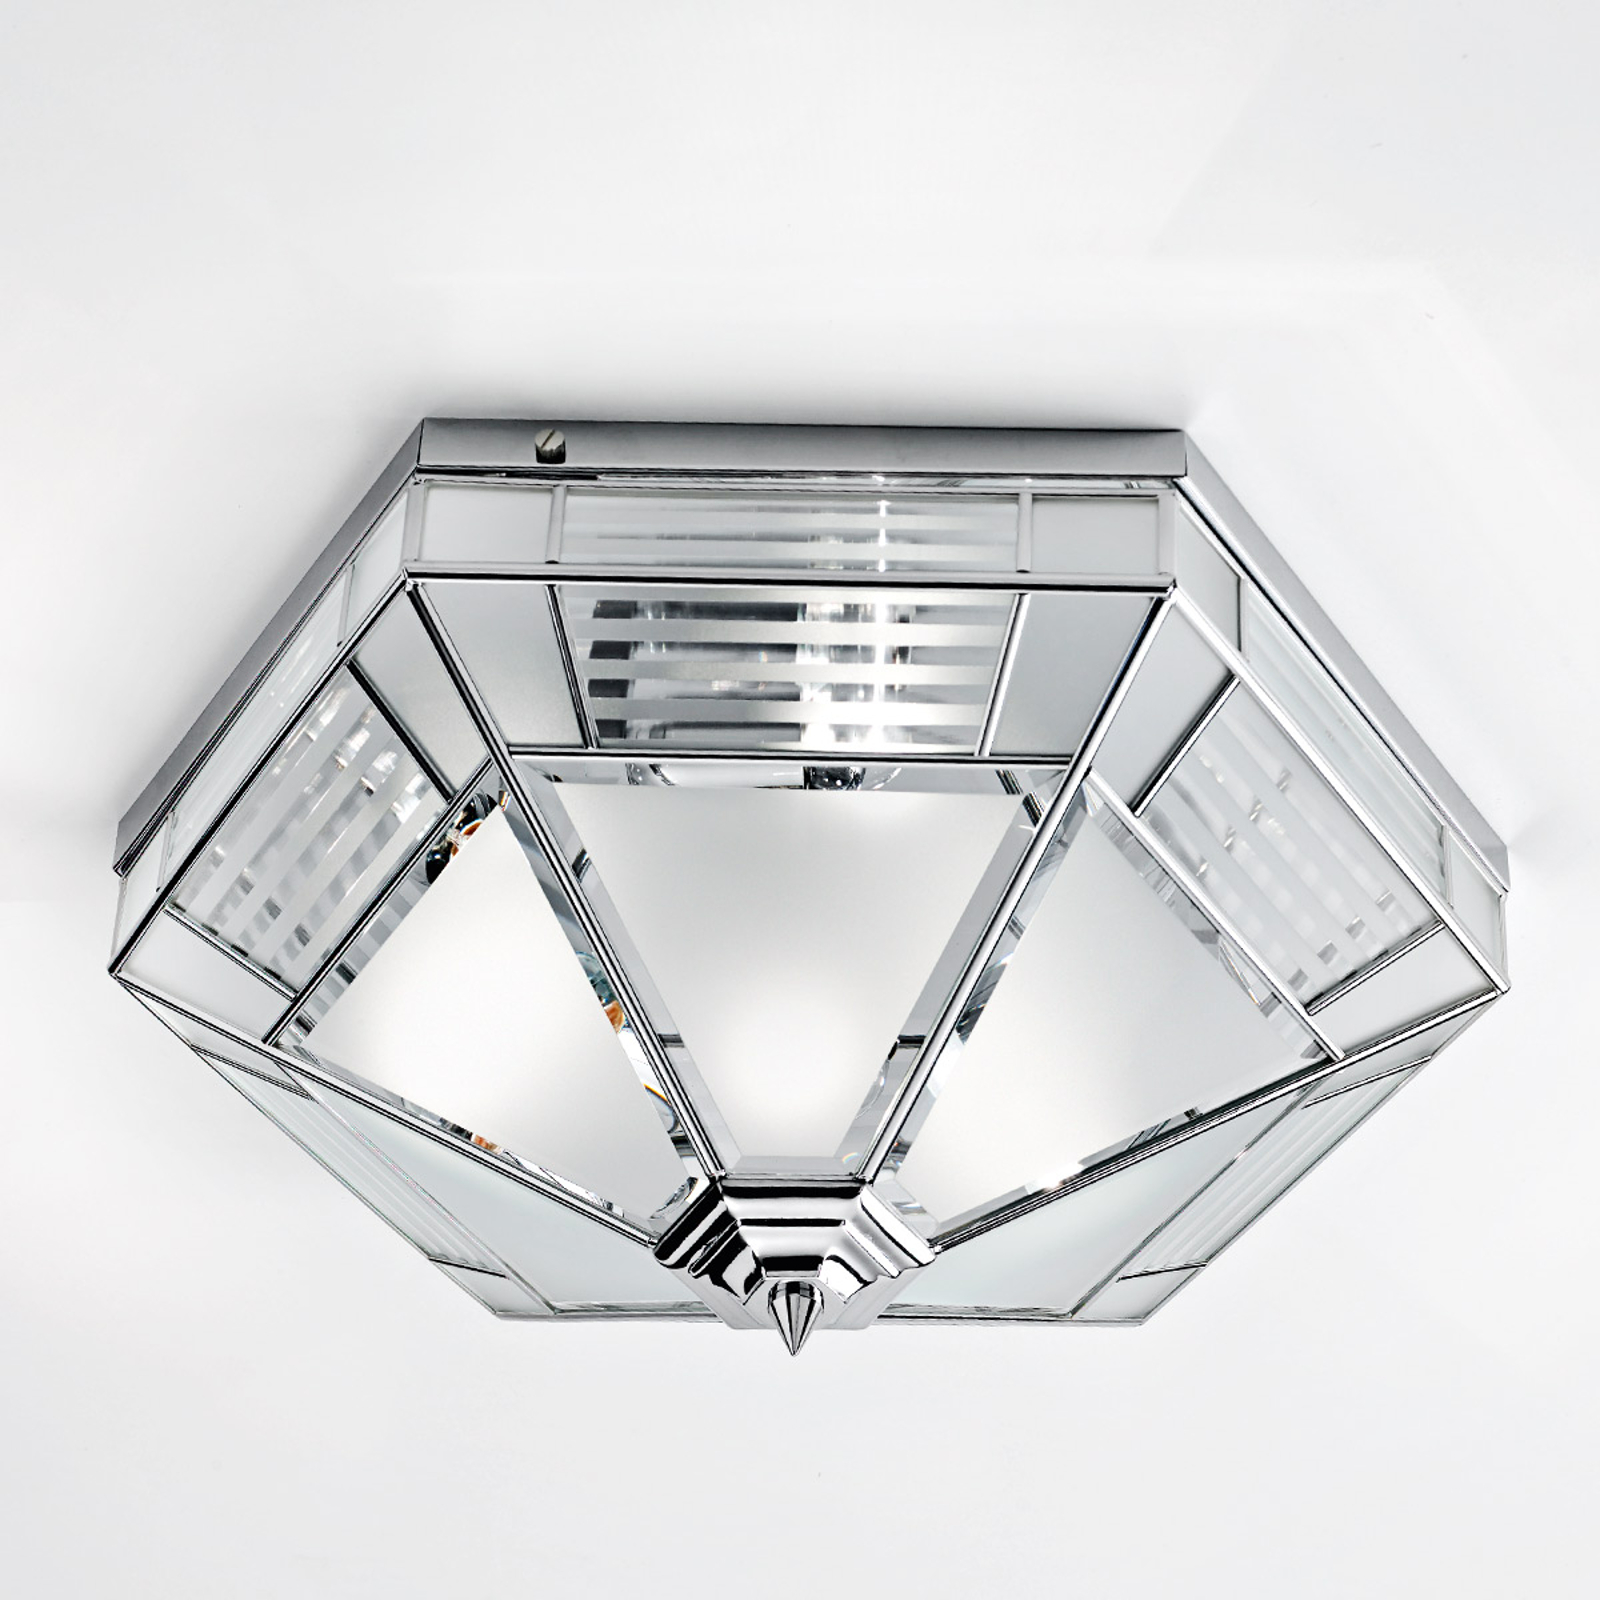 Giana sexkantig plafondlampa, krom